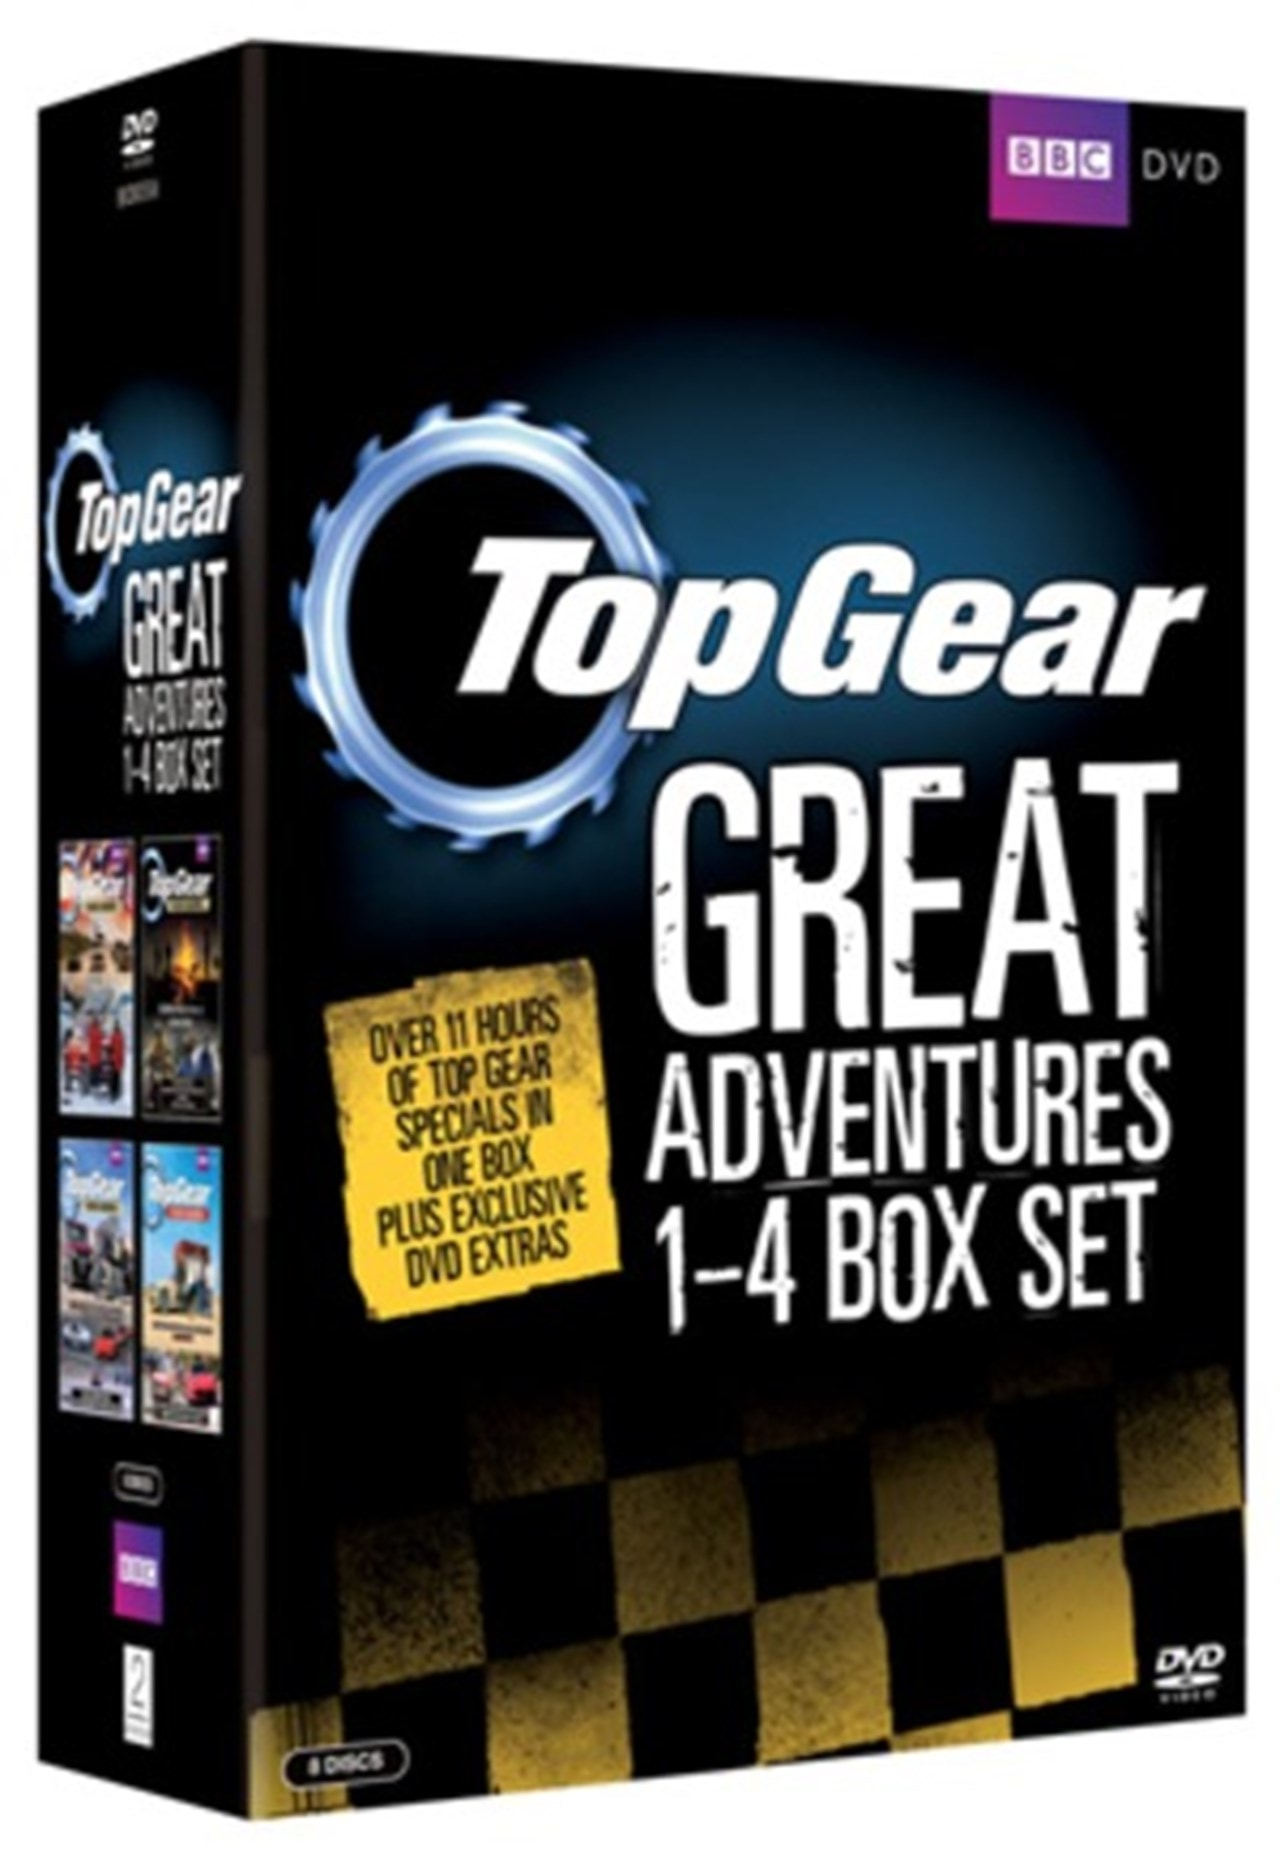 Top Gear - The Great Adventures: 1-4 - 1